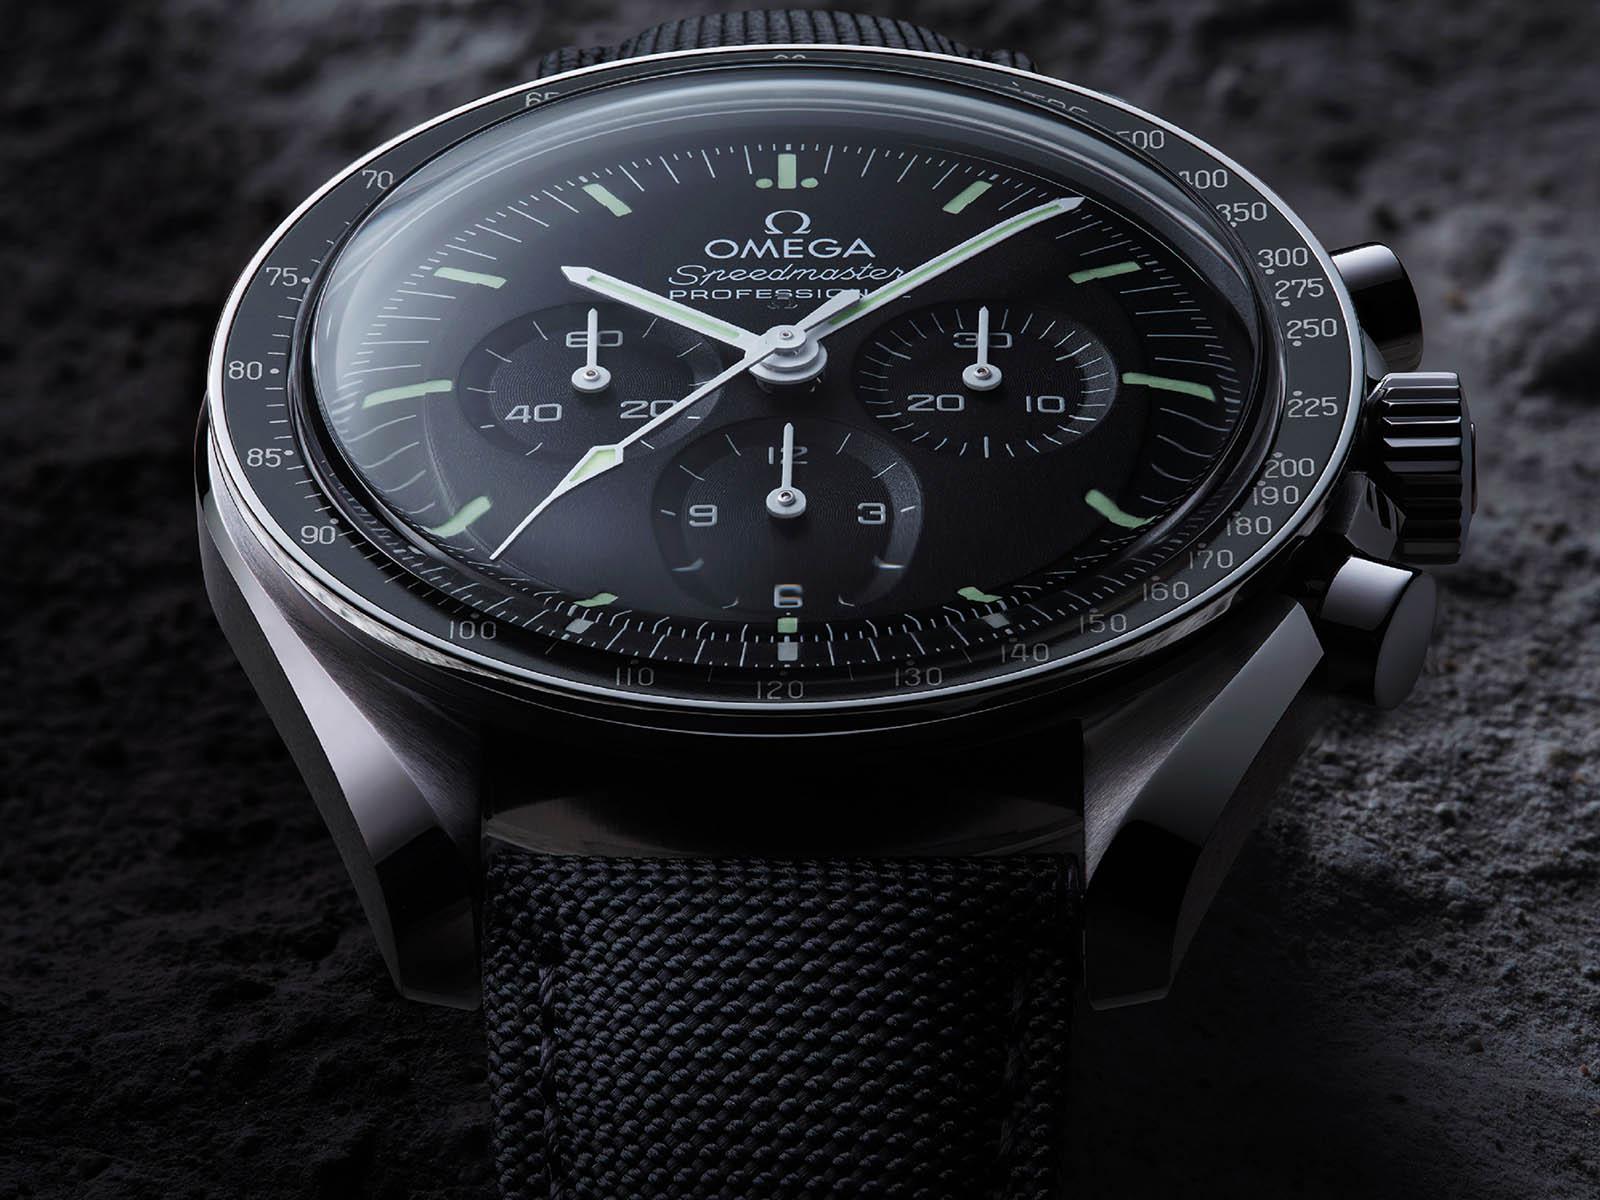 omega-speedmaster-moonwatch-professional-master-chronometer-3.jpg